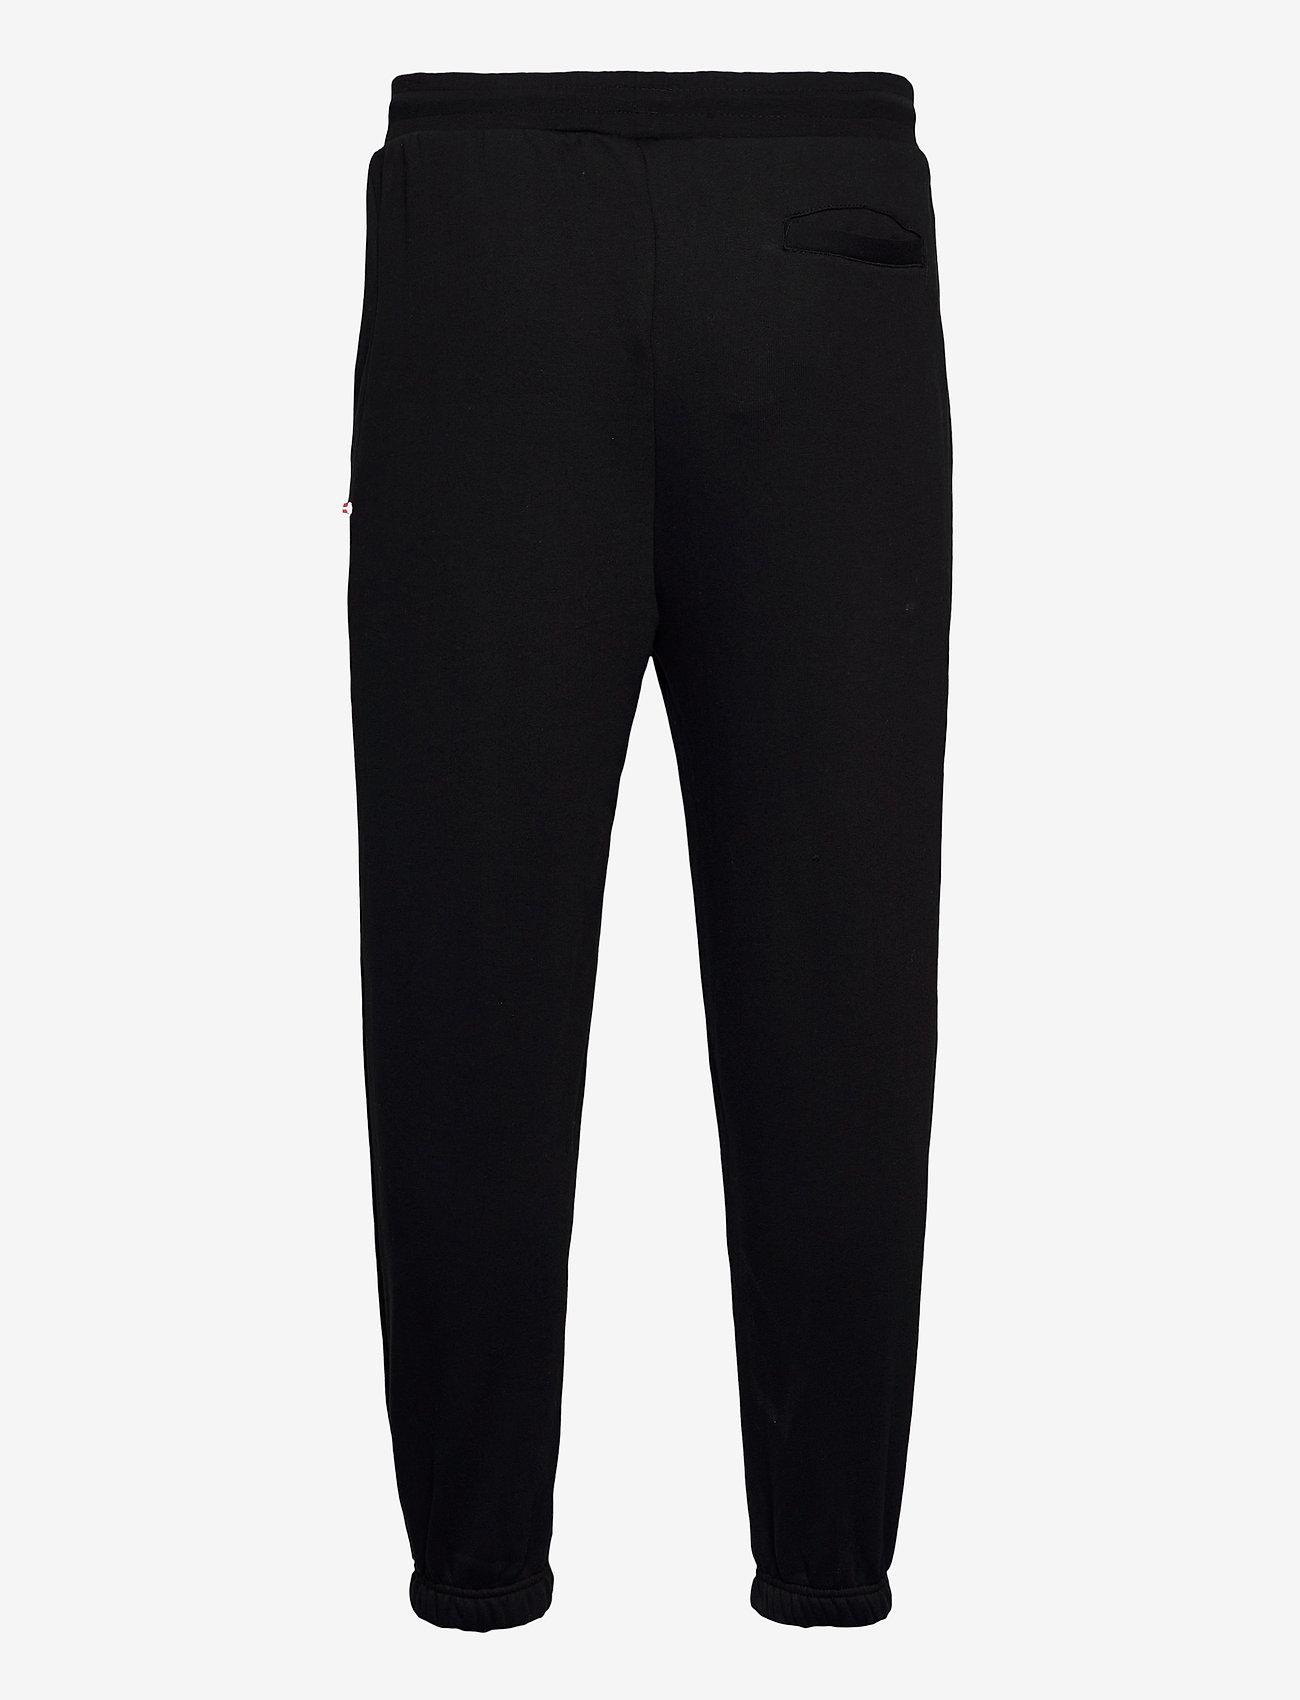 HAN Kjøbenhavn - Sweat Pants - kleding - black logo - 1